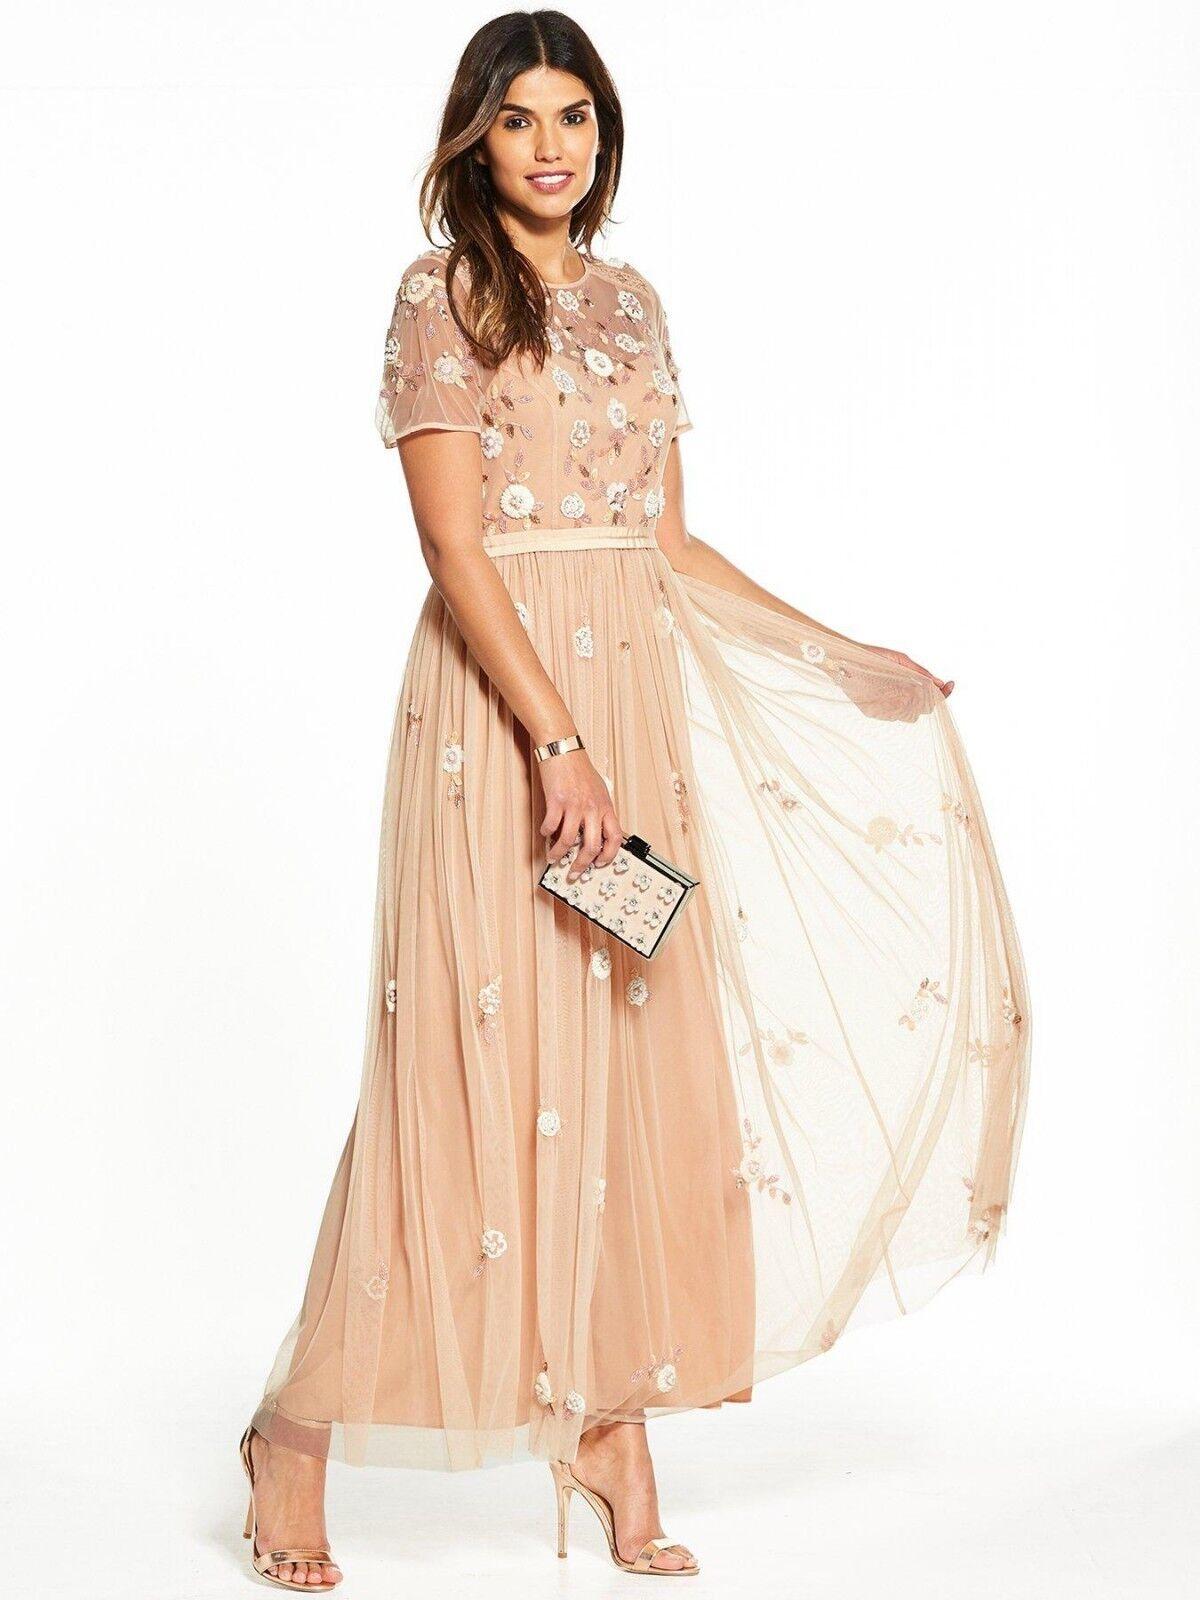 V by Very Embellished Maxi Dress Size 18 bluesh